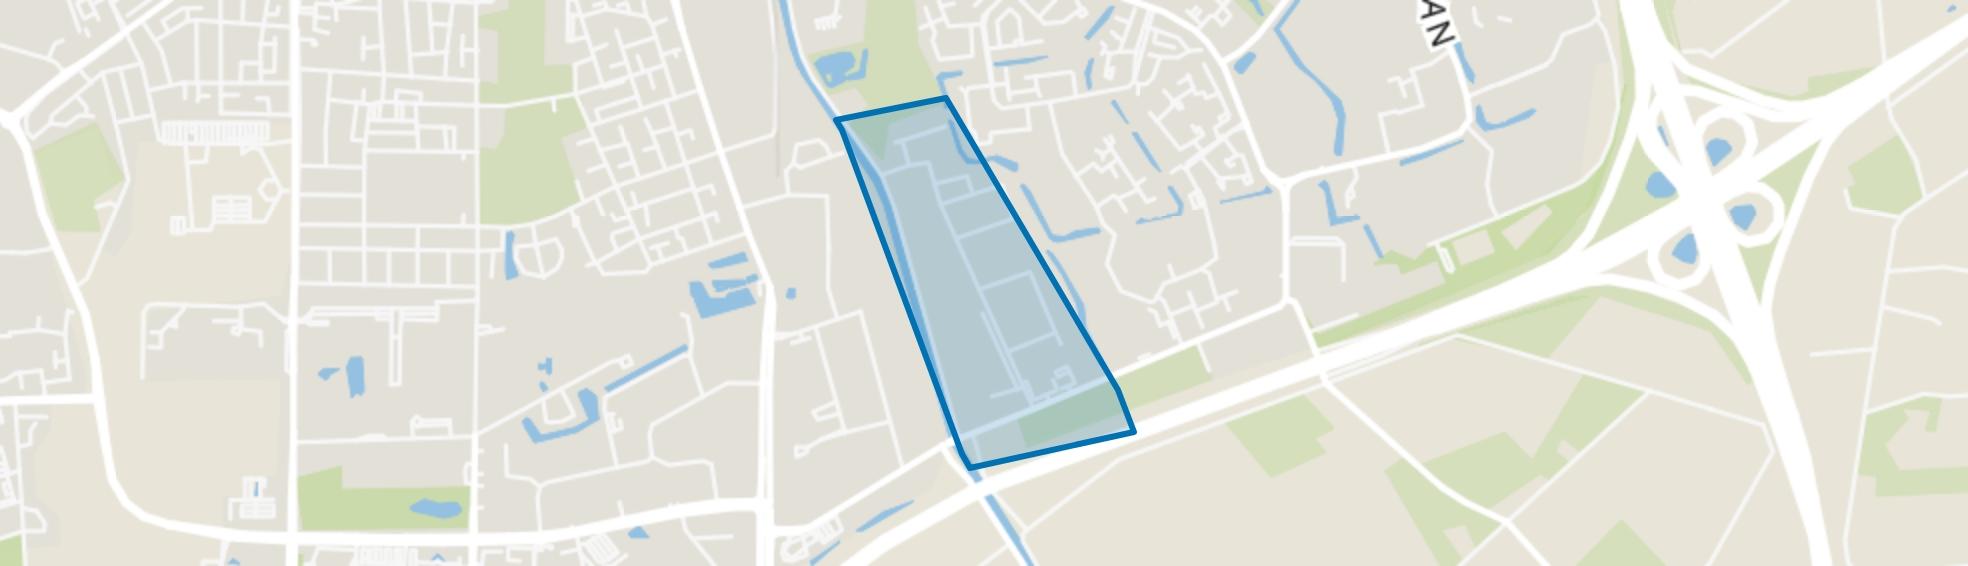 Kuipersveld, Apeldoorn map